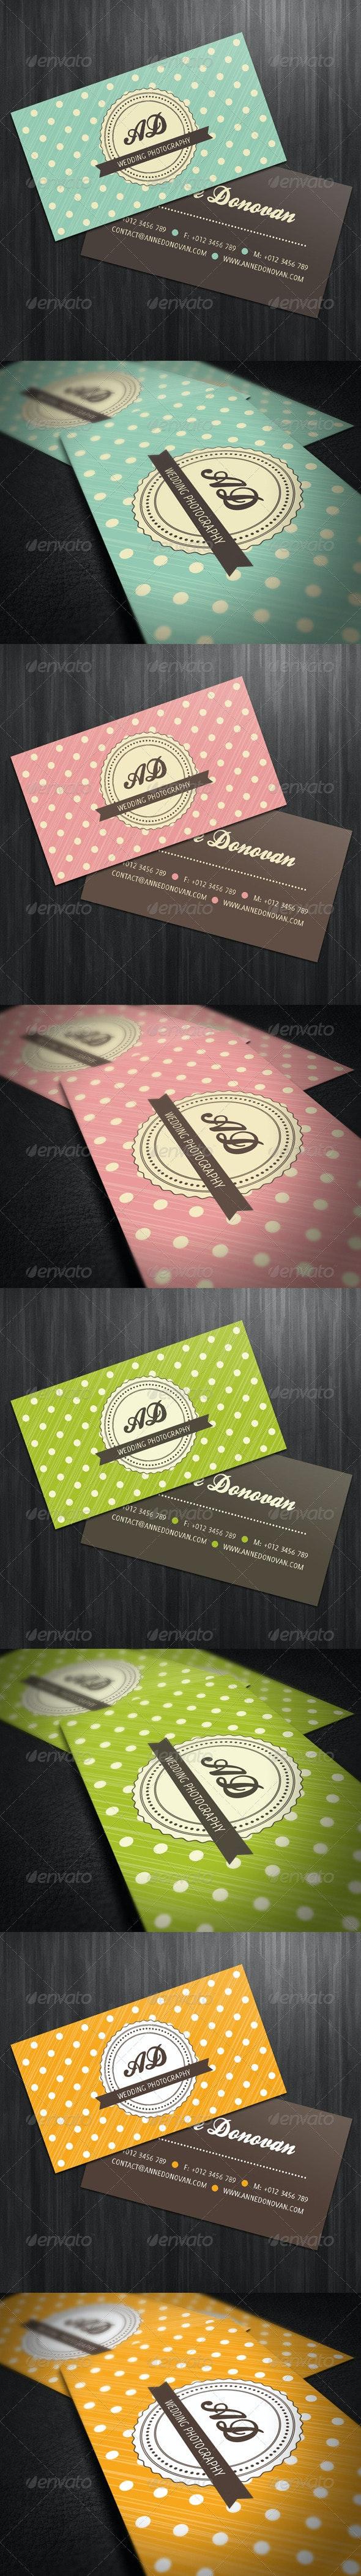 Retro Business Card (4 Color Variations) - Retro/Vintage Business Cards